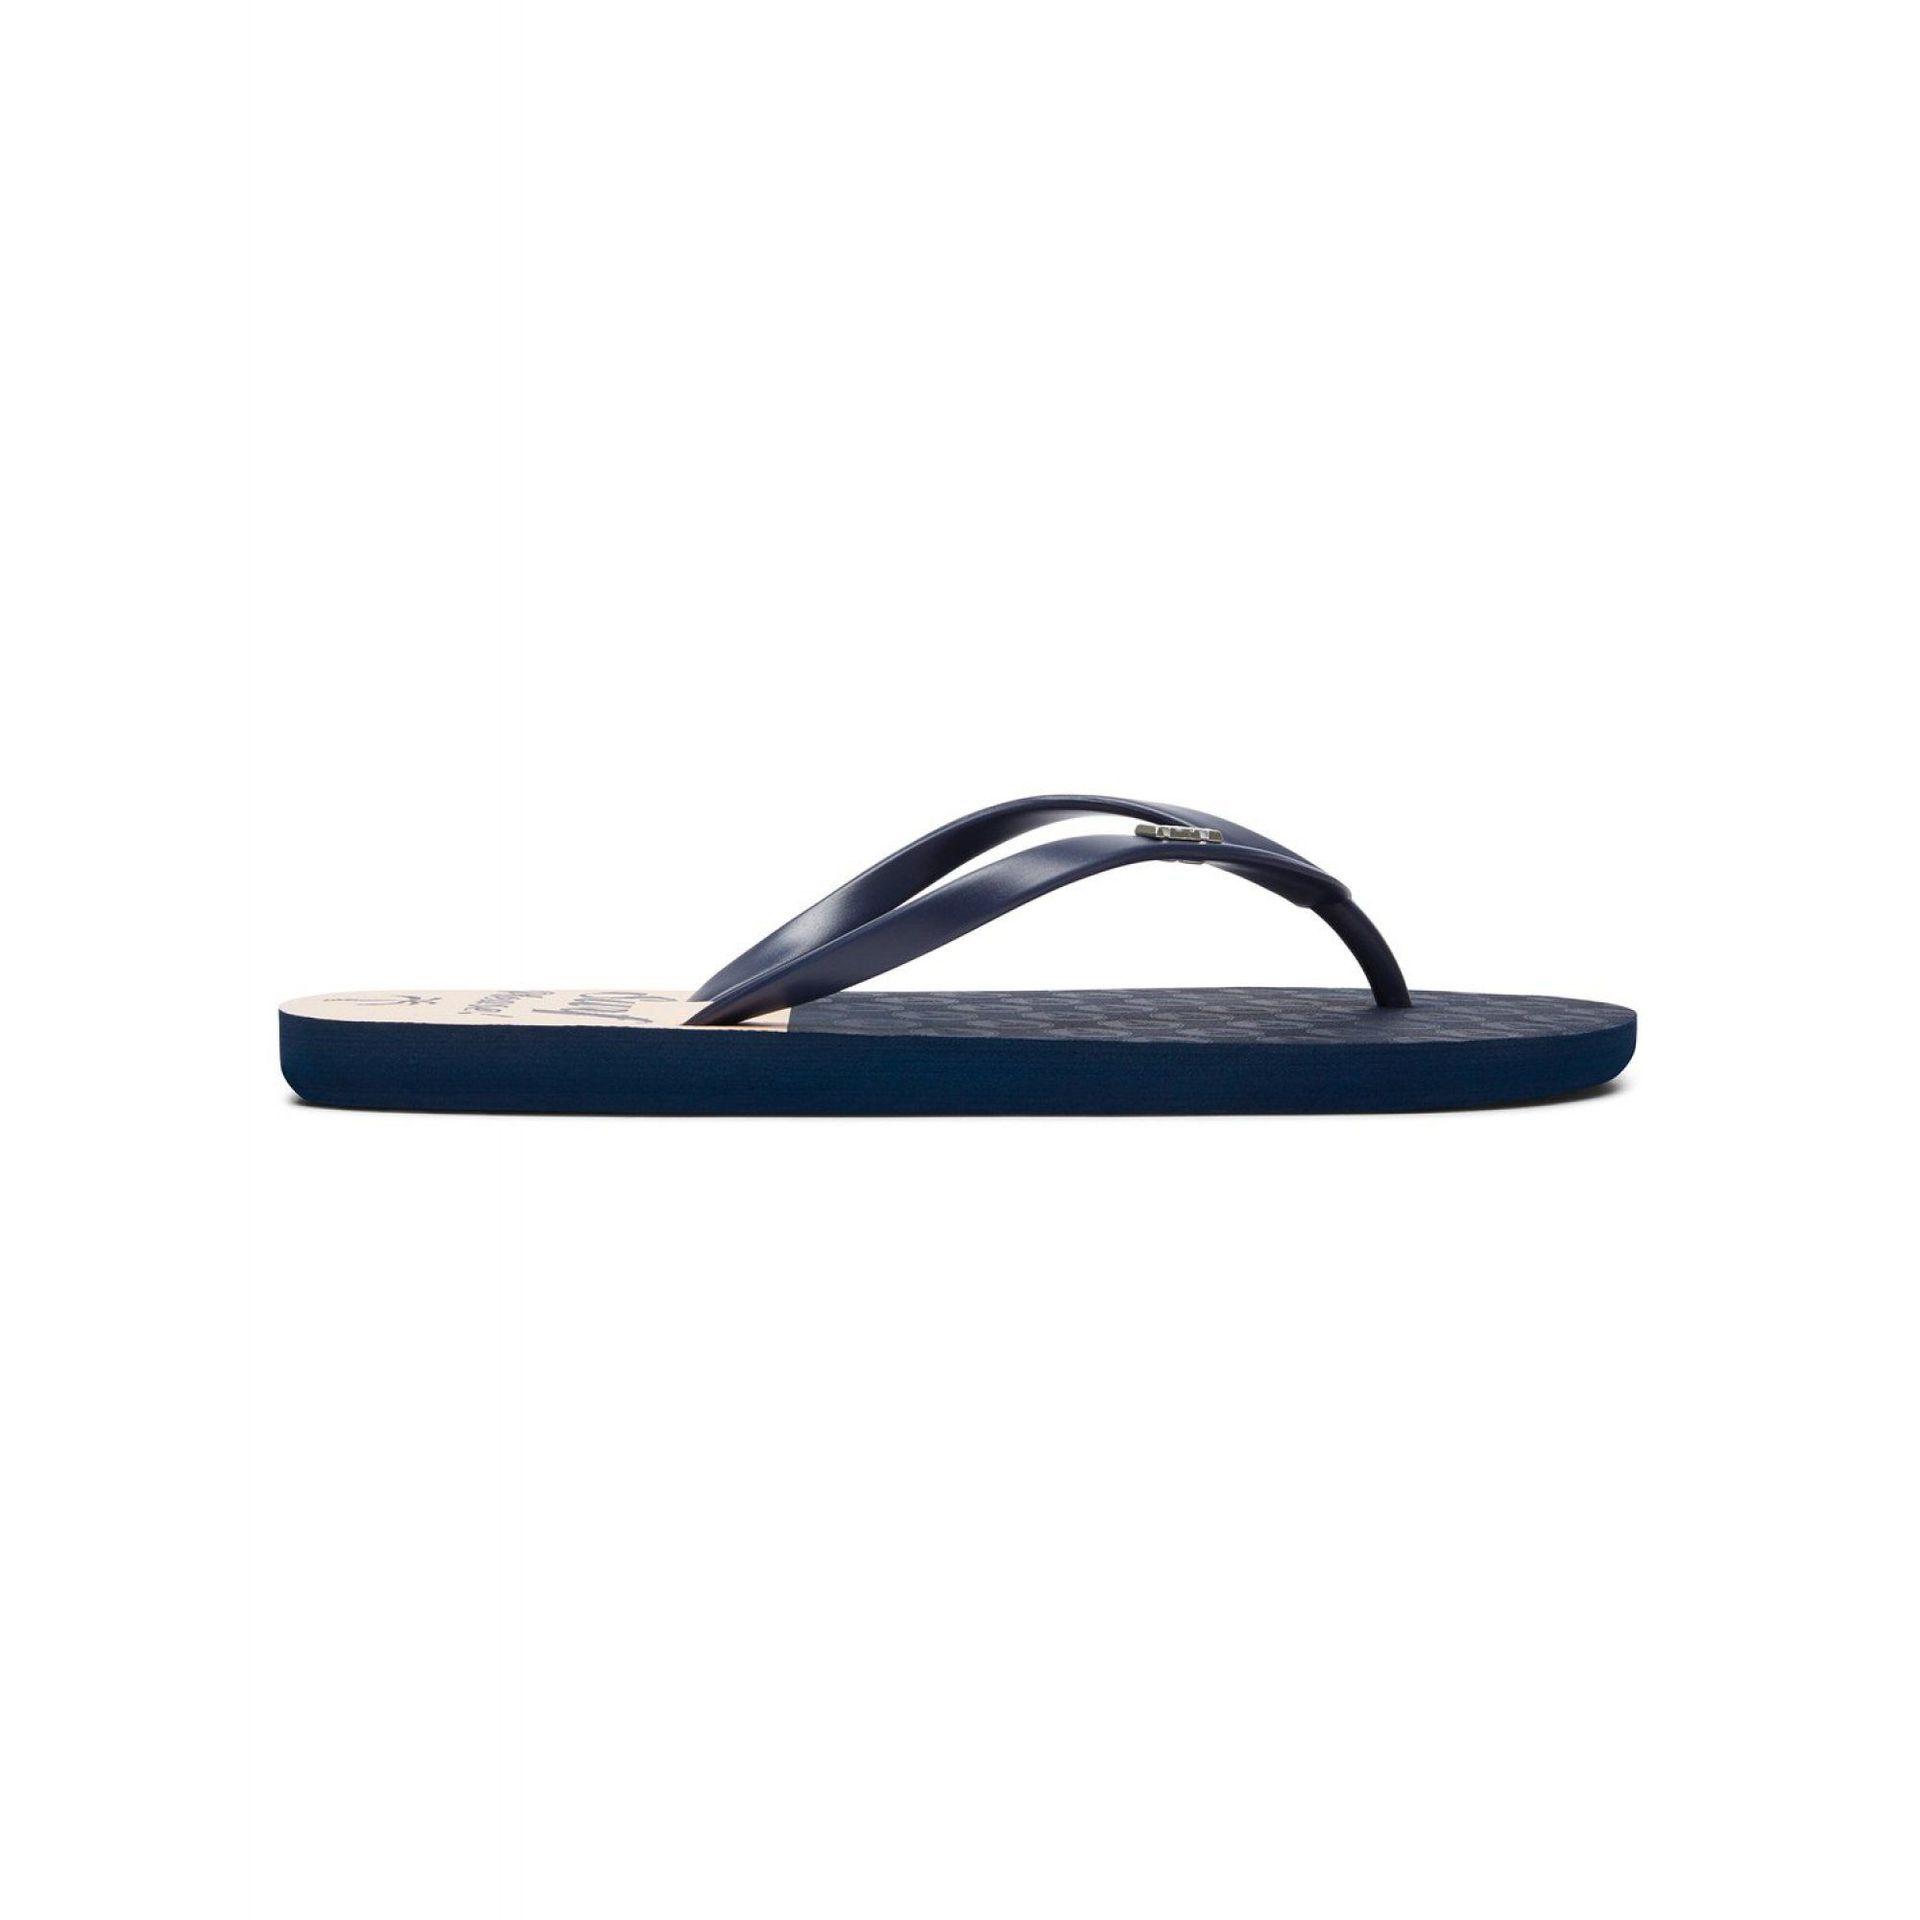 KLAPKI ROXY VIVA STAMP  NAUTICAL BLUE 1